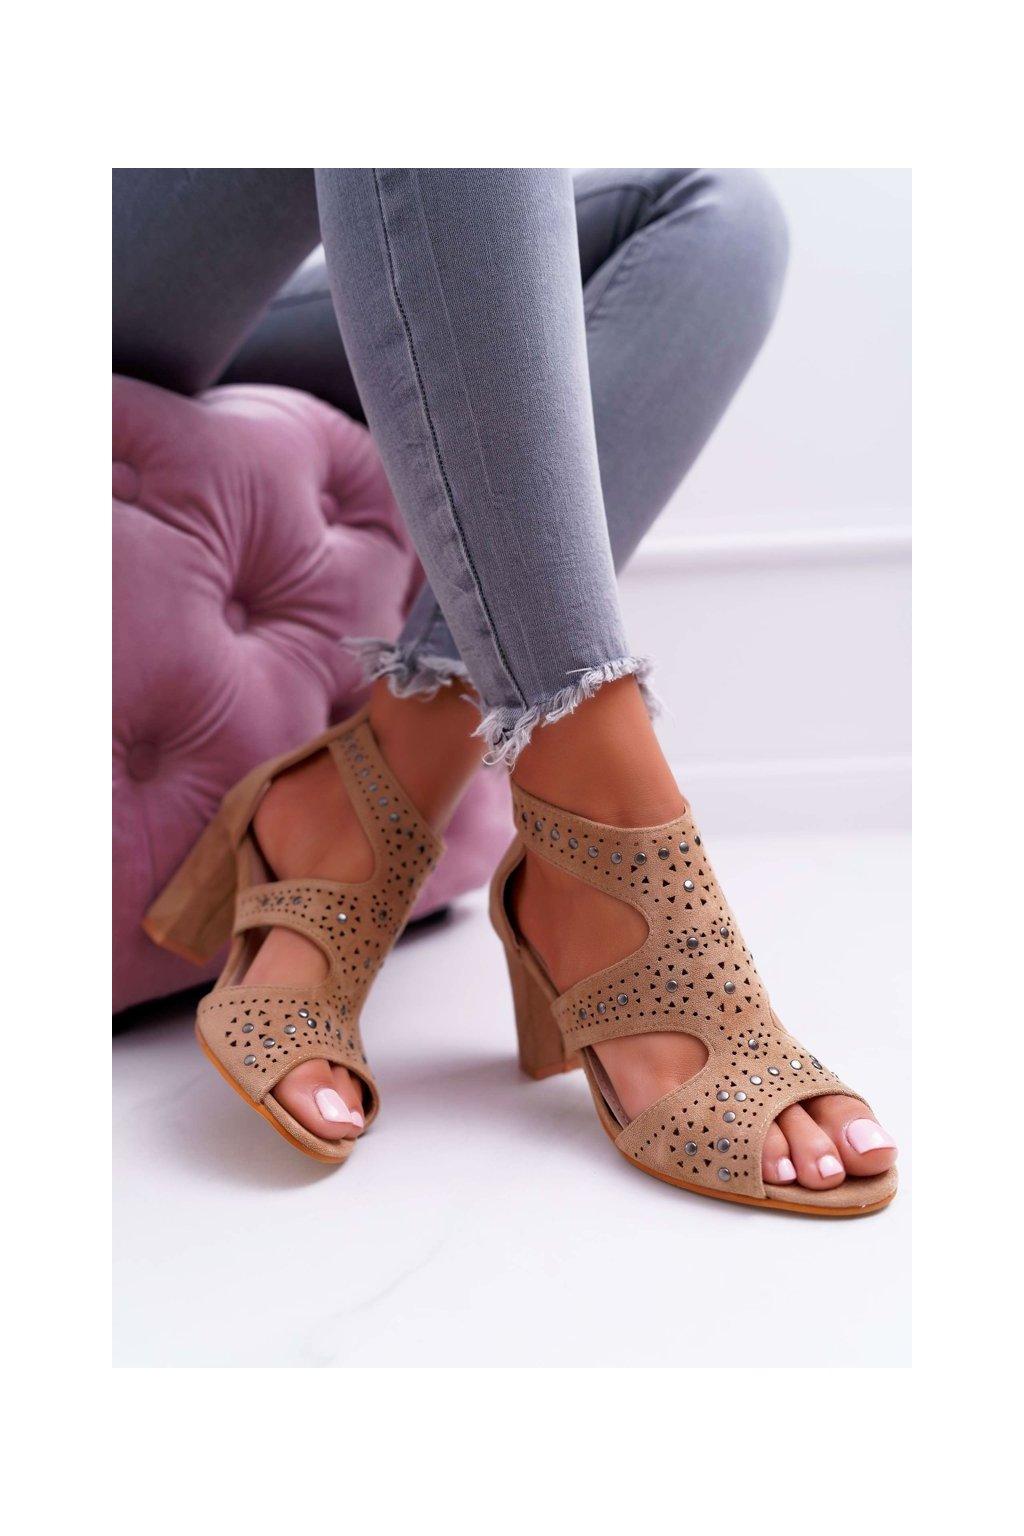 Dámske sandále na podpätku farba hnedá kód obuvi 1162-973 CAMEL